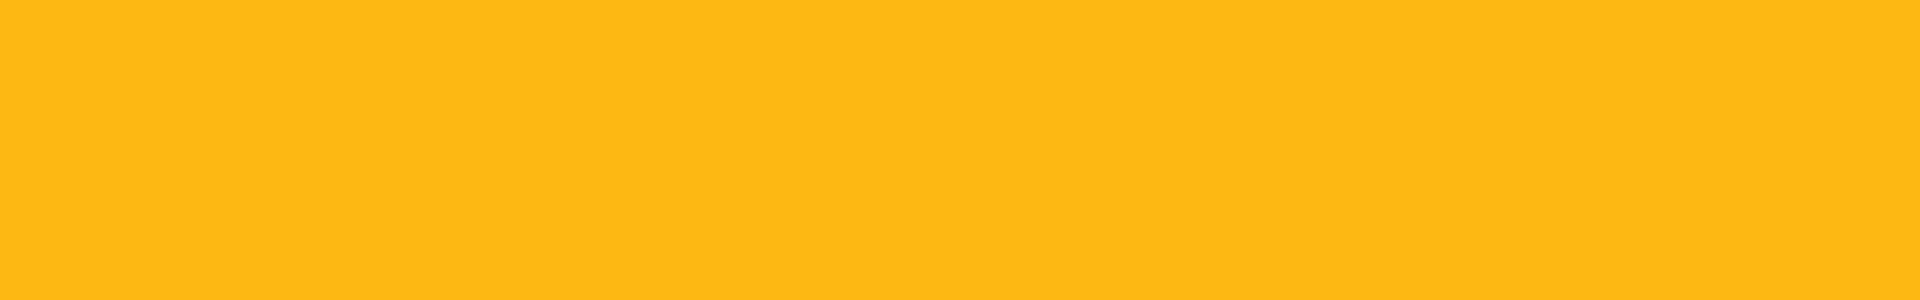 ajandek tarsas slide 01 yellow